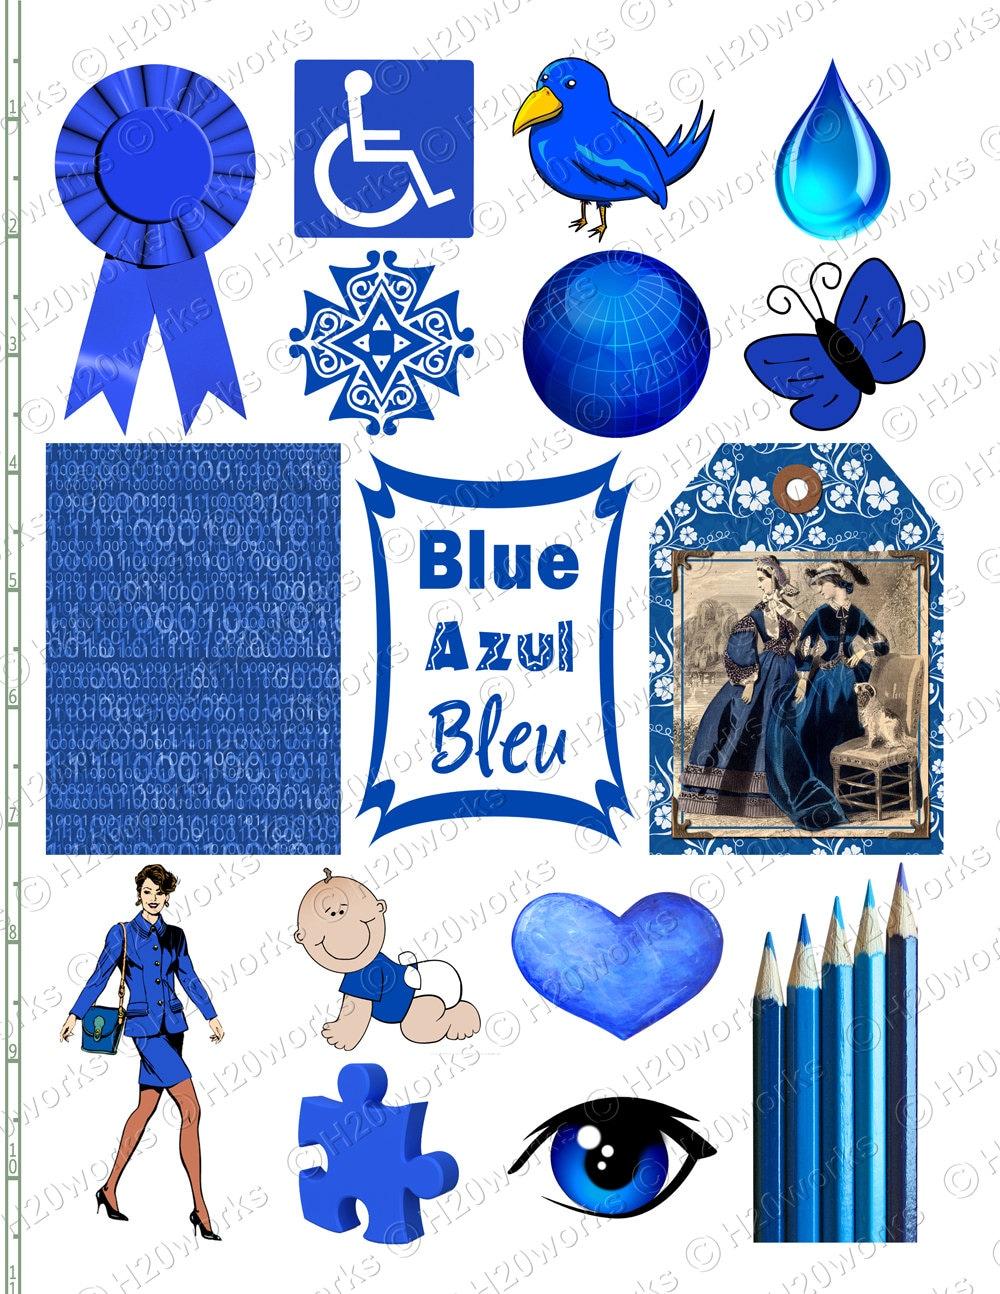 Blue Stuff On 85x11 Sheet Things That on Preschool Name Tag